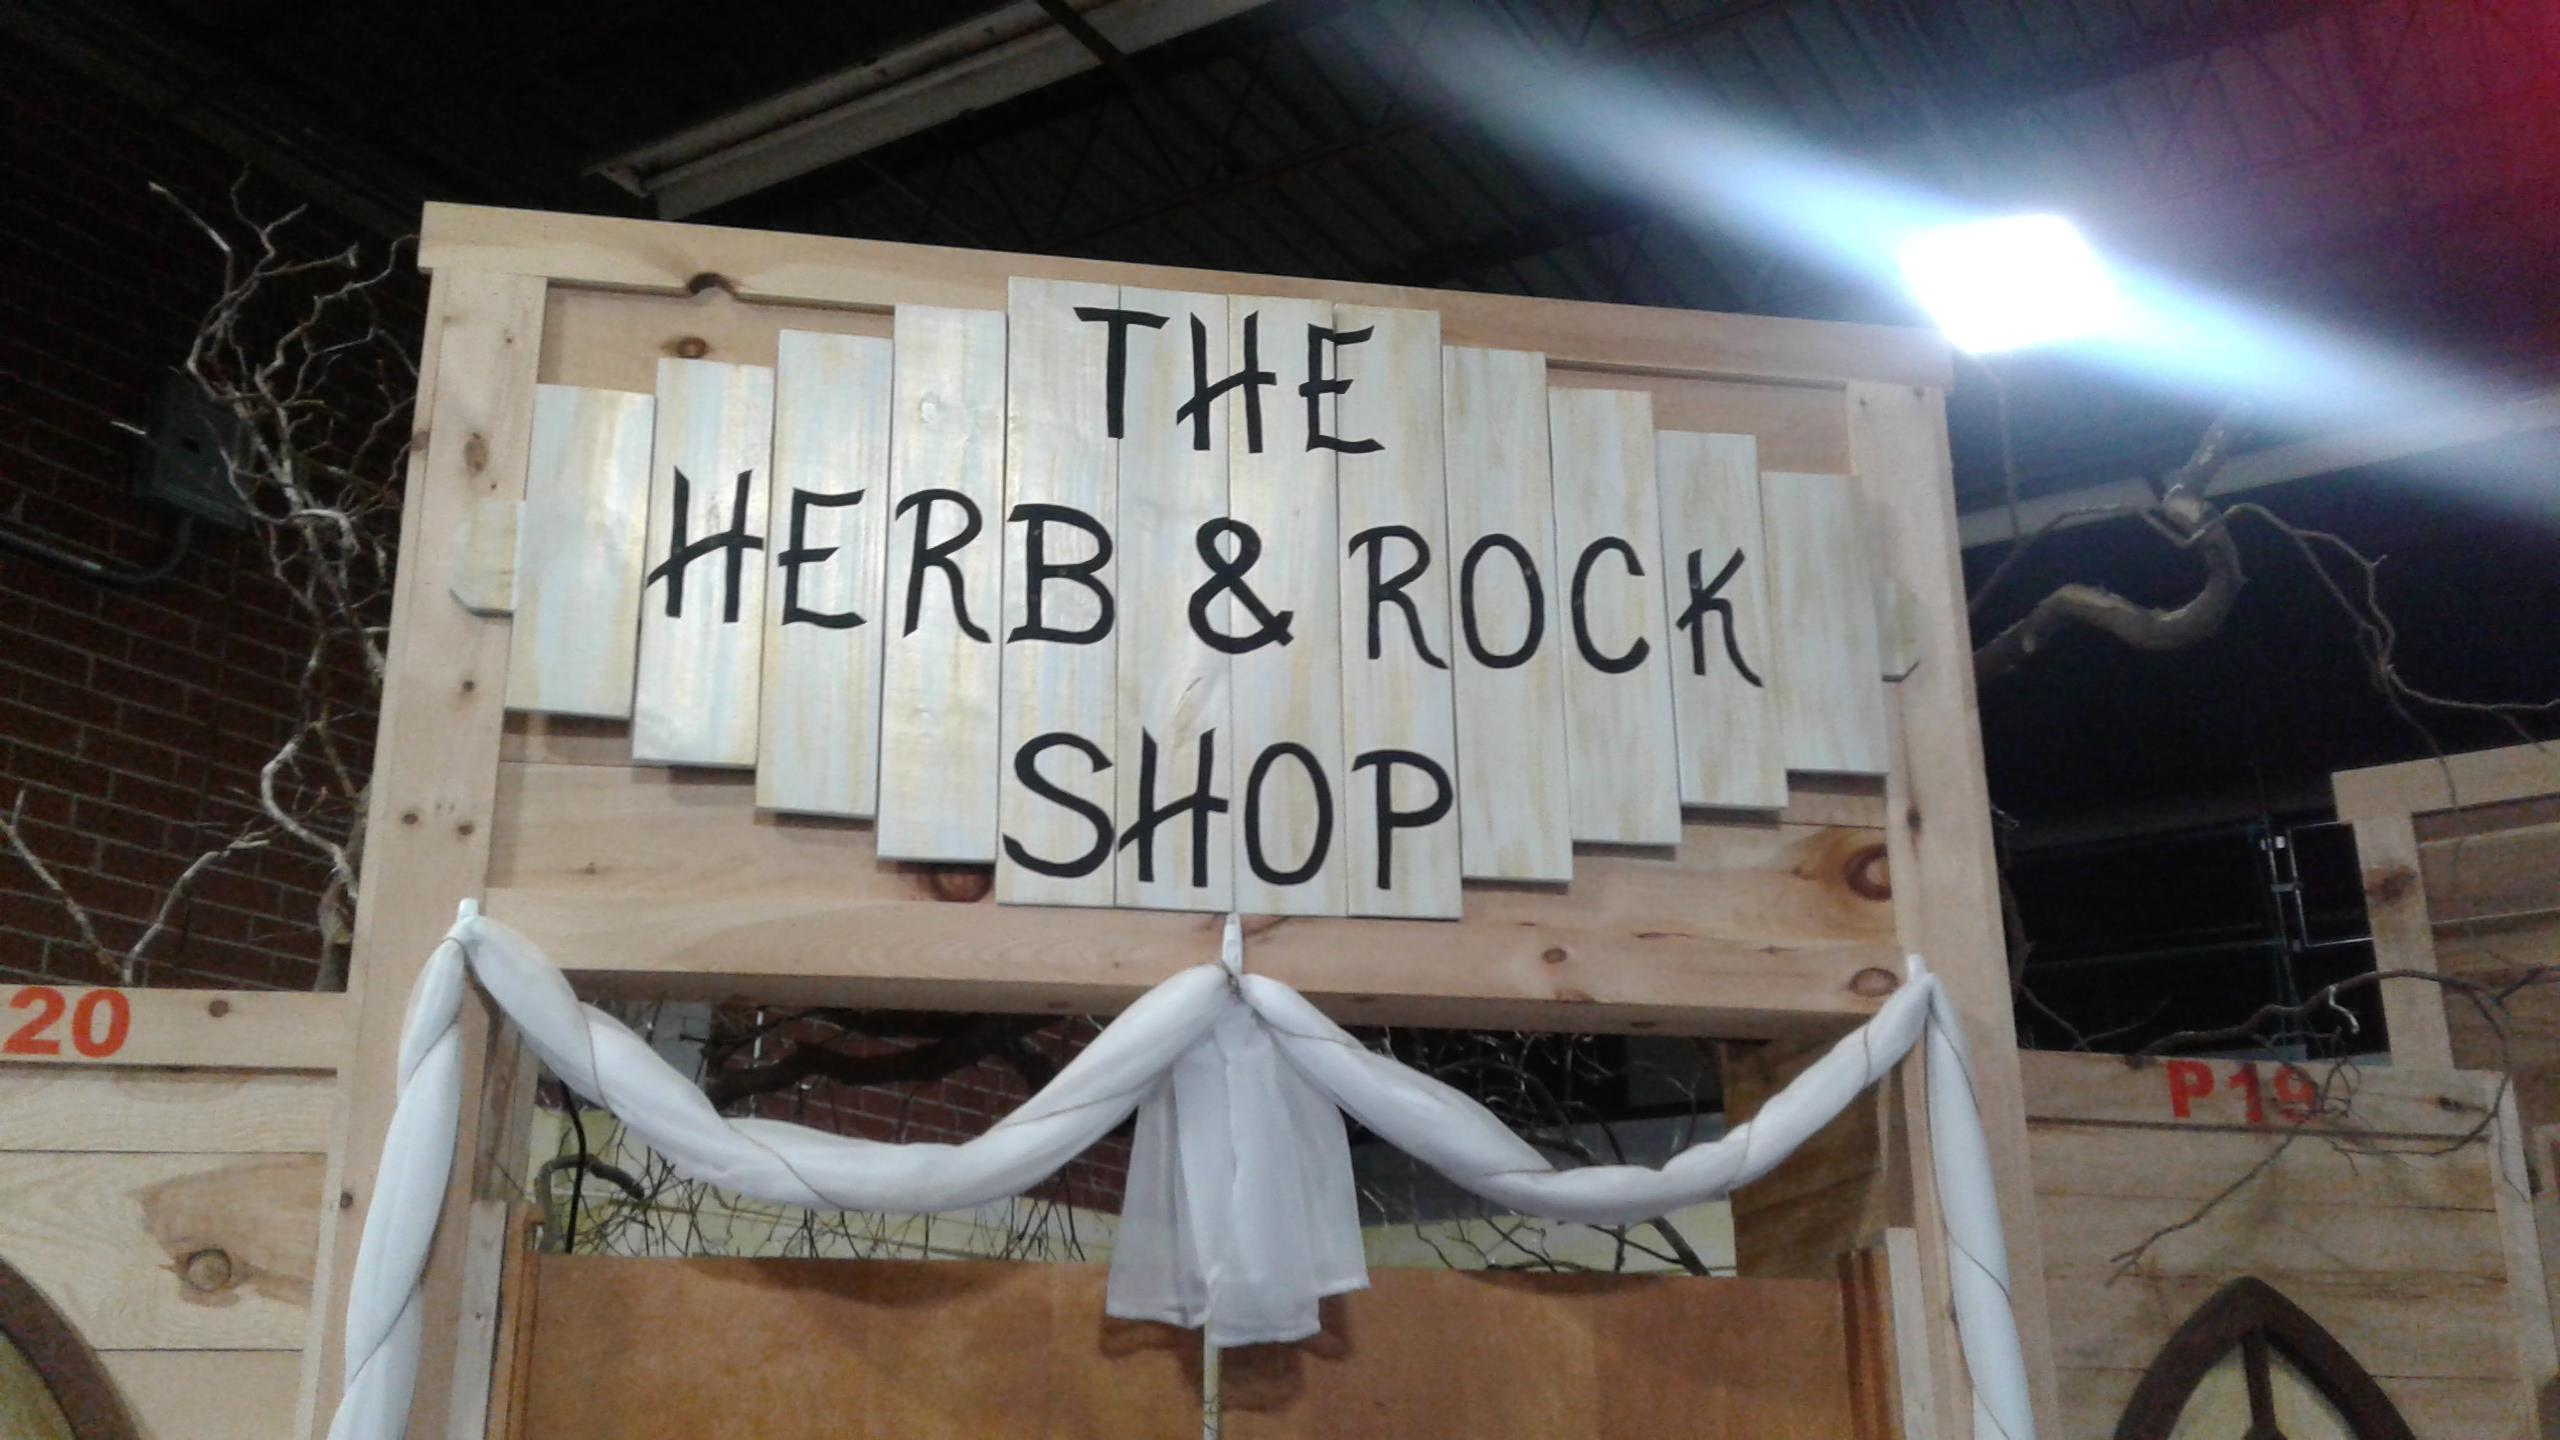 The Herb & Rock Shop – P19